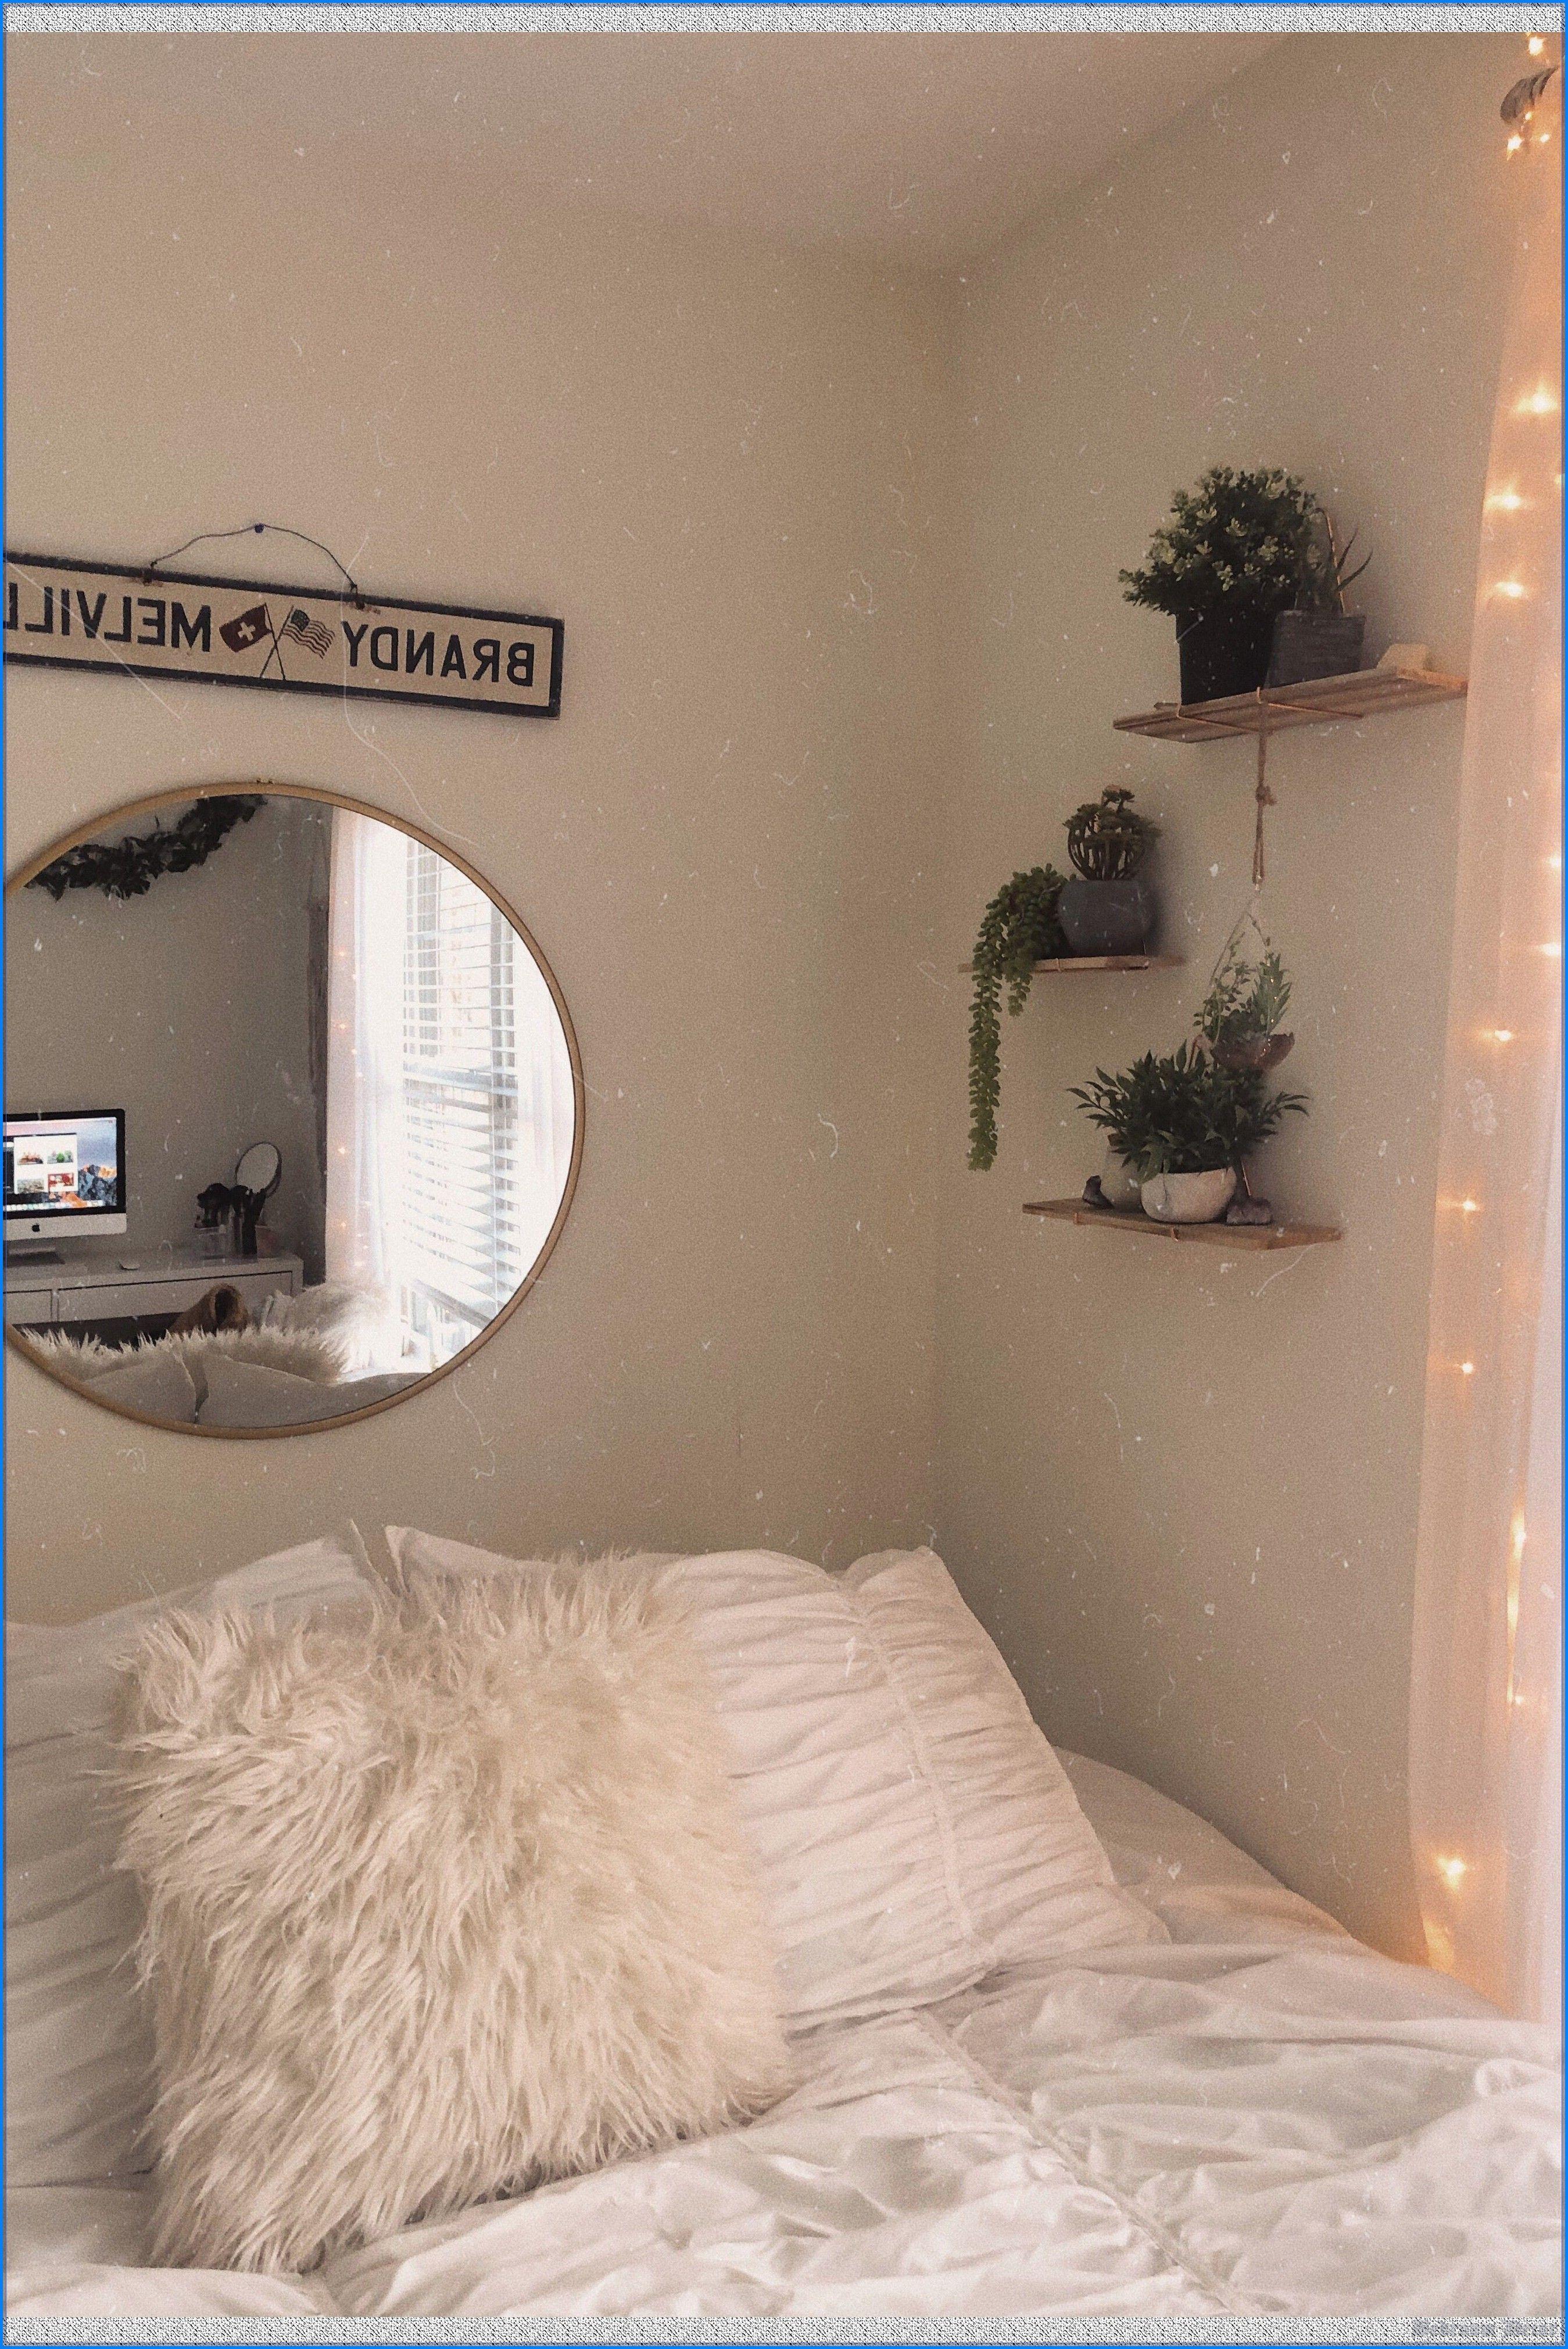 How To Teach Bedroom Decor Like A Pro